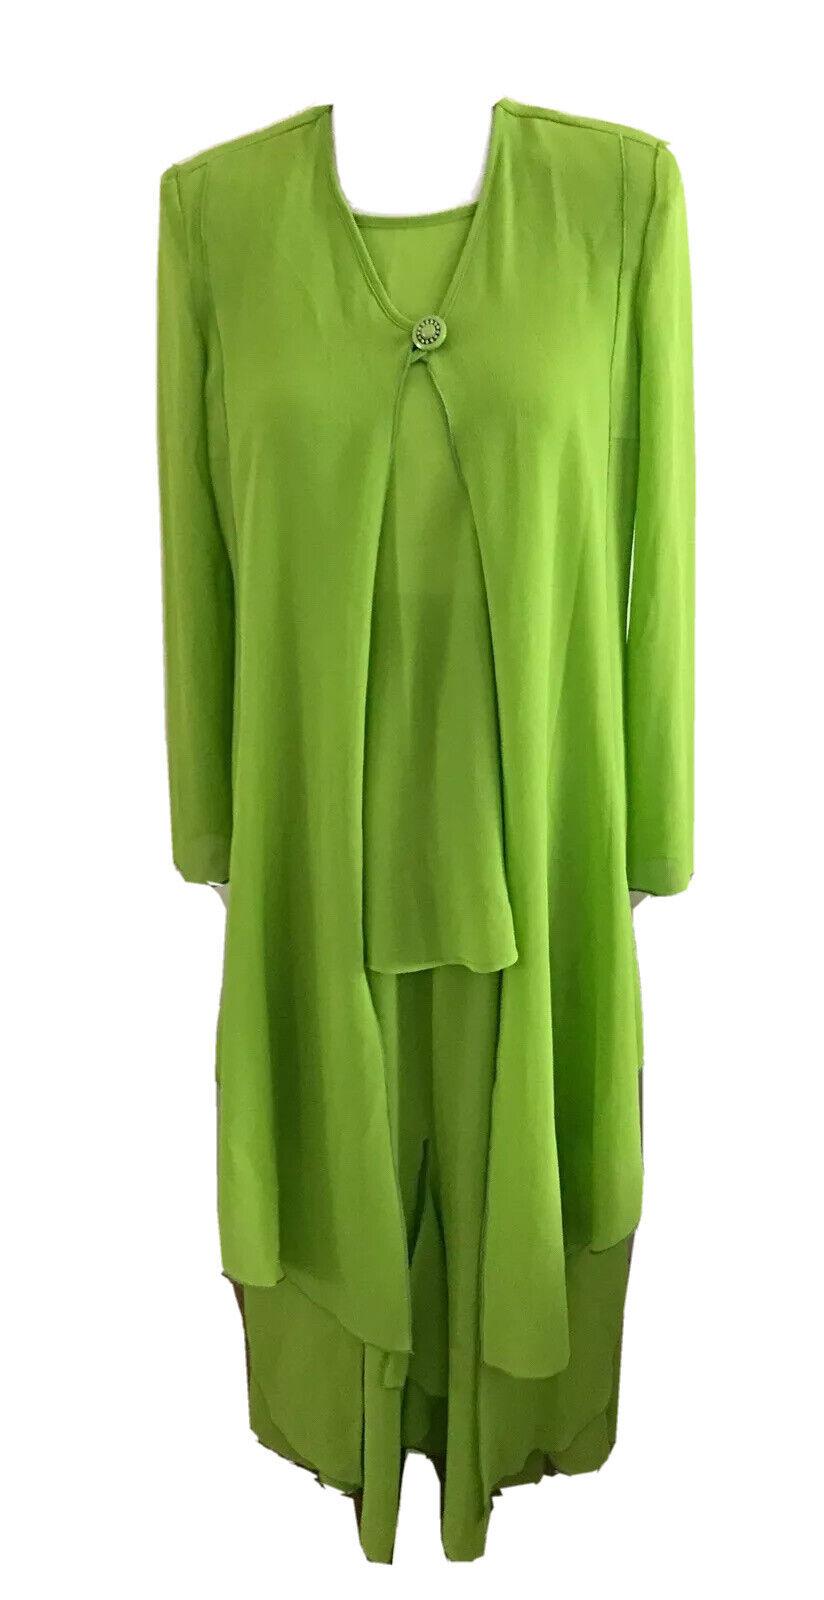 Design Todays Womens 3 Pc Green Button Jacket Tank Skirt Outfit Suit Dress Sz S